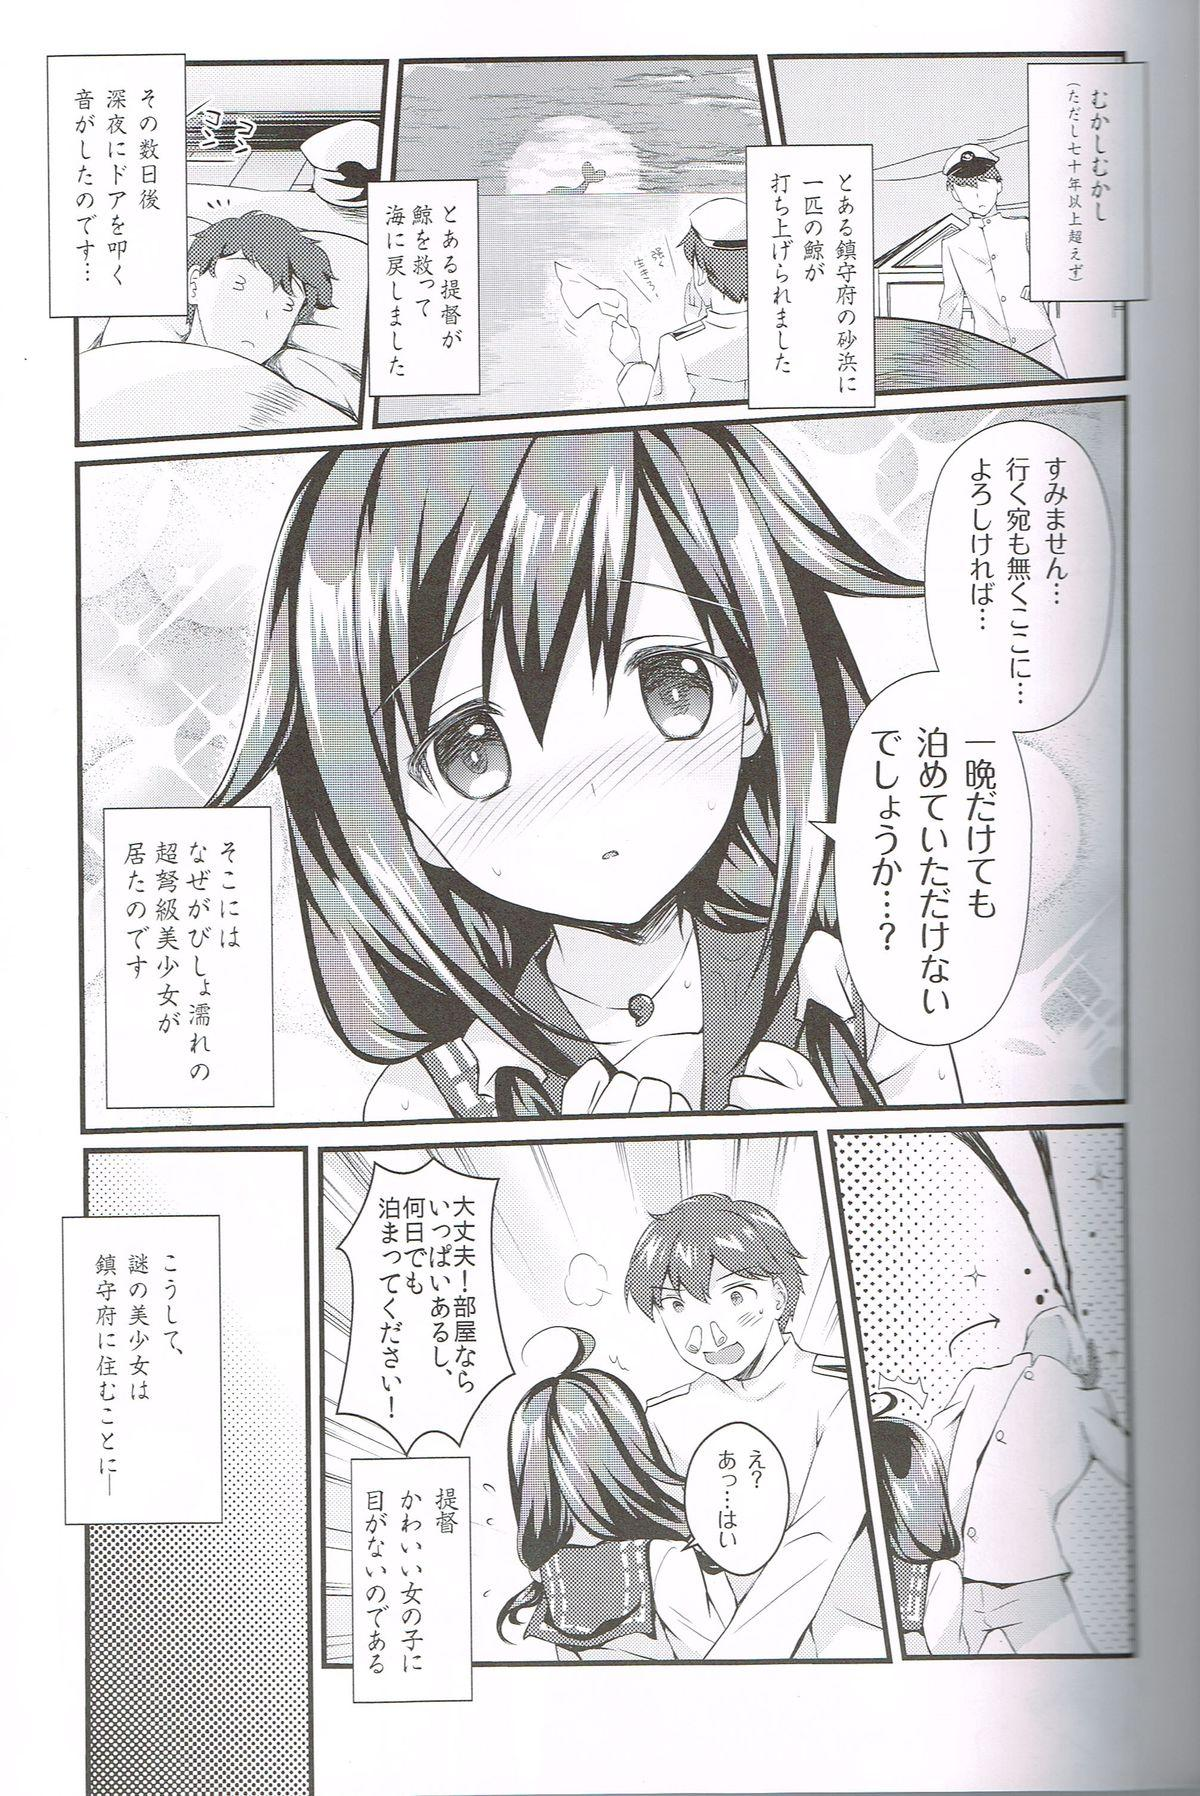 Kujira no ongaeshi 1